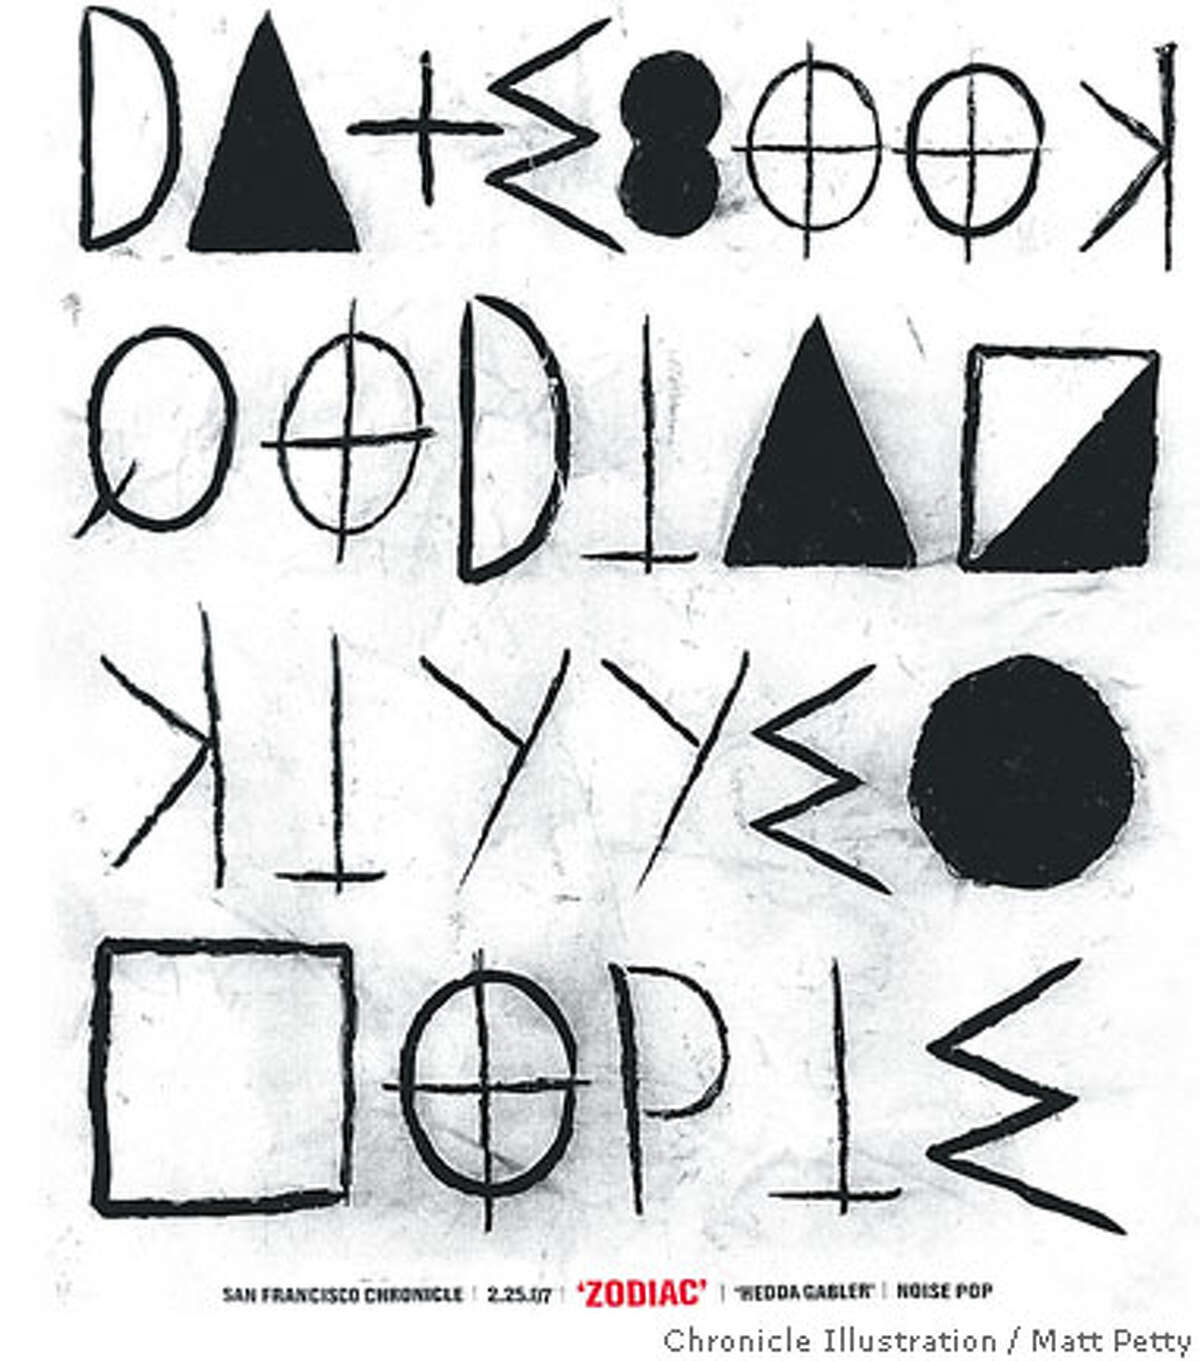 'Zodiak' Datebook Cover. Chronicle illustration by Matt Petty